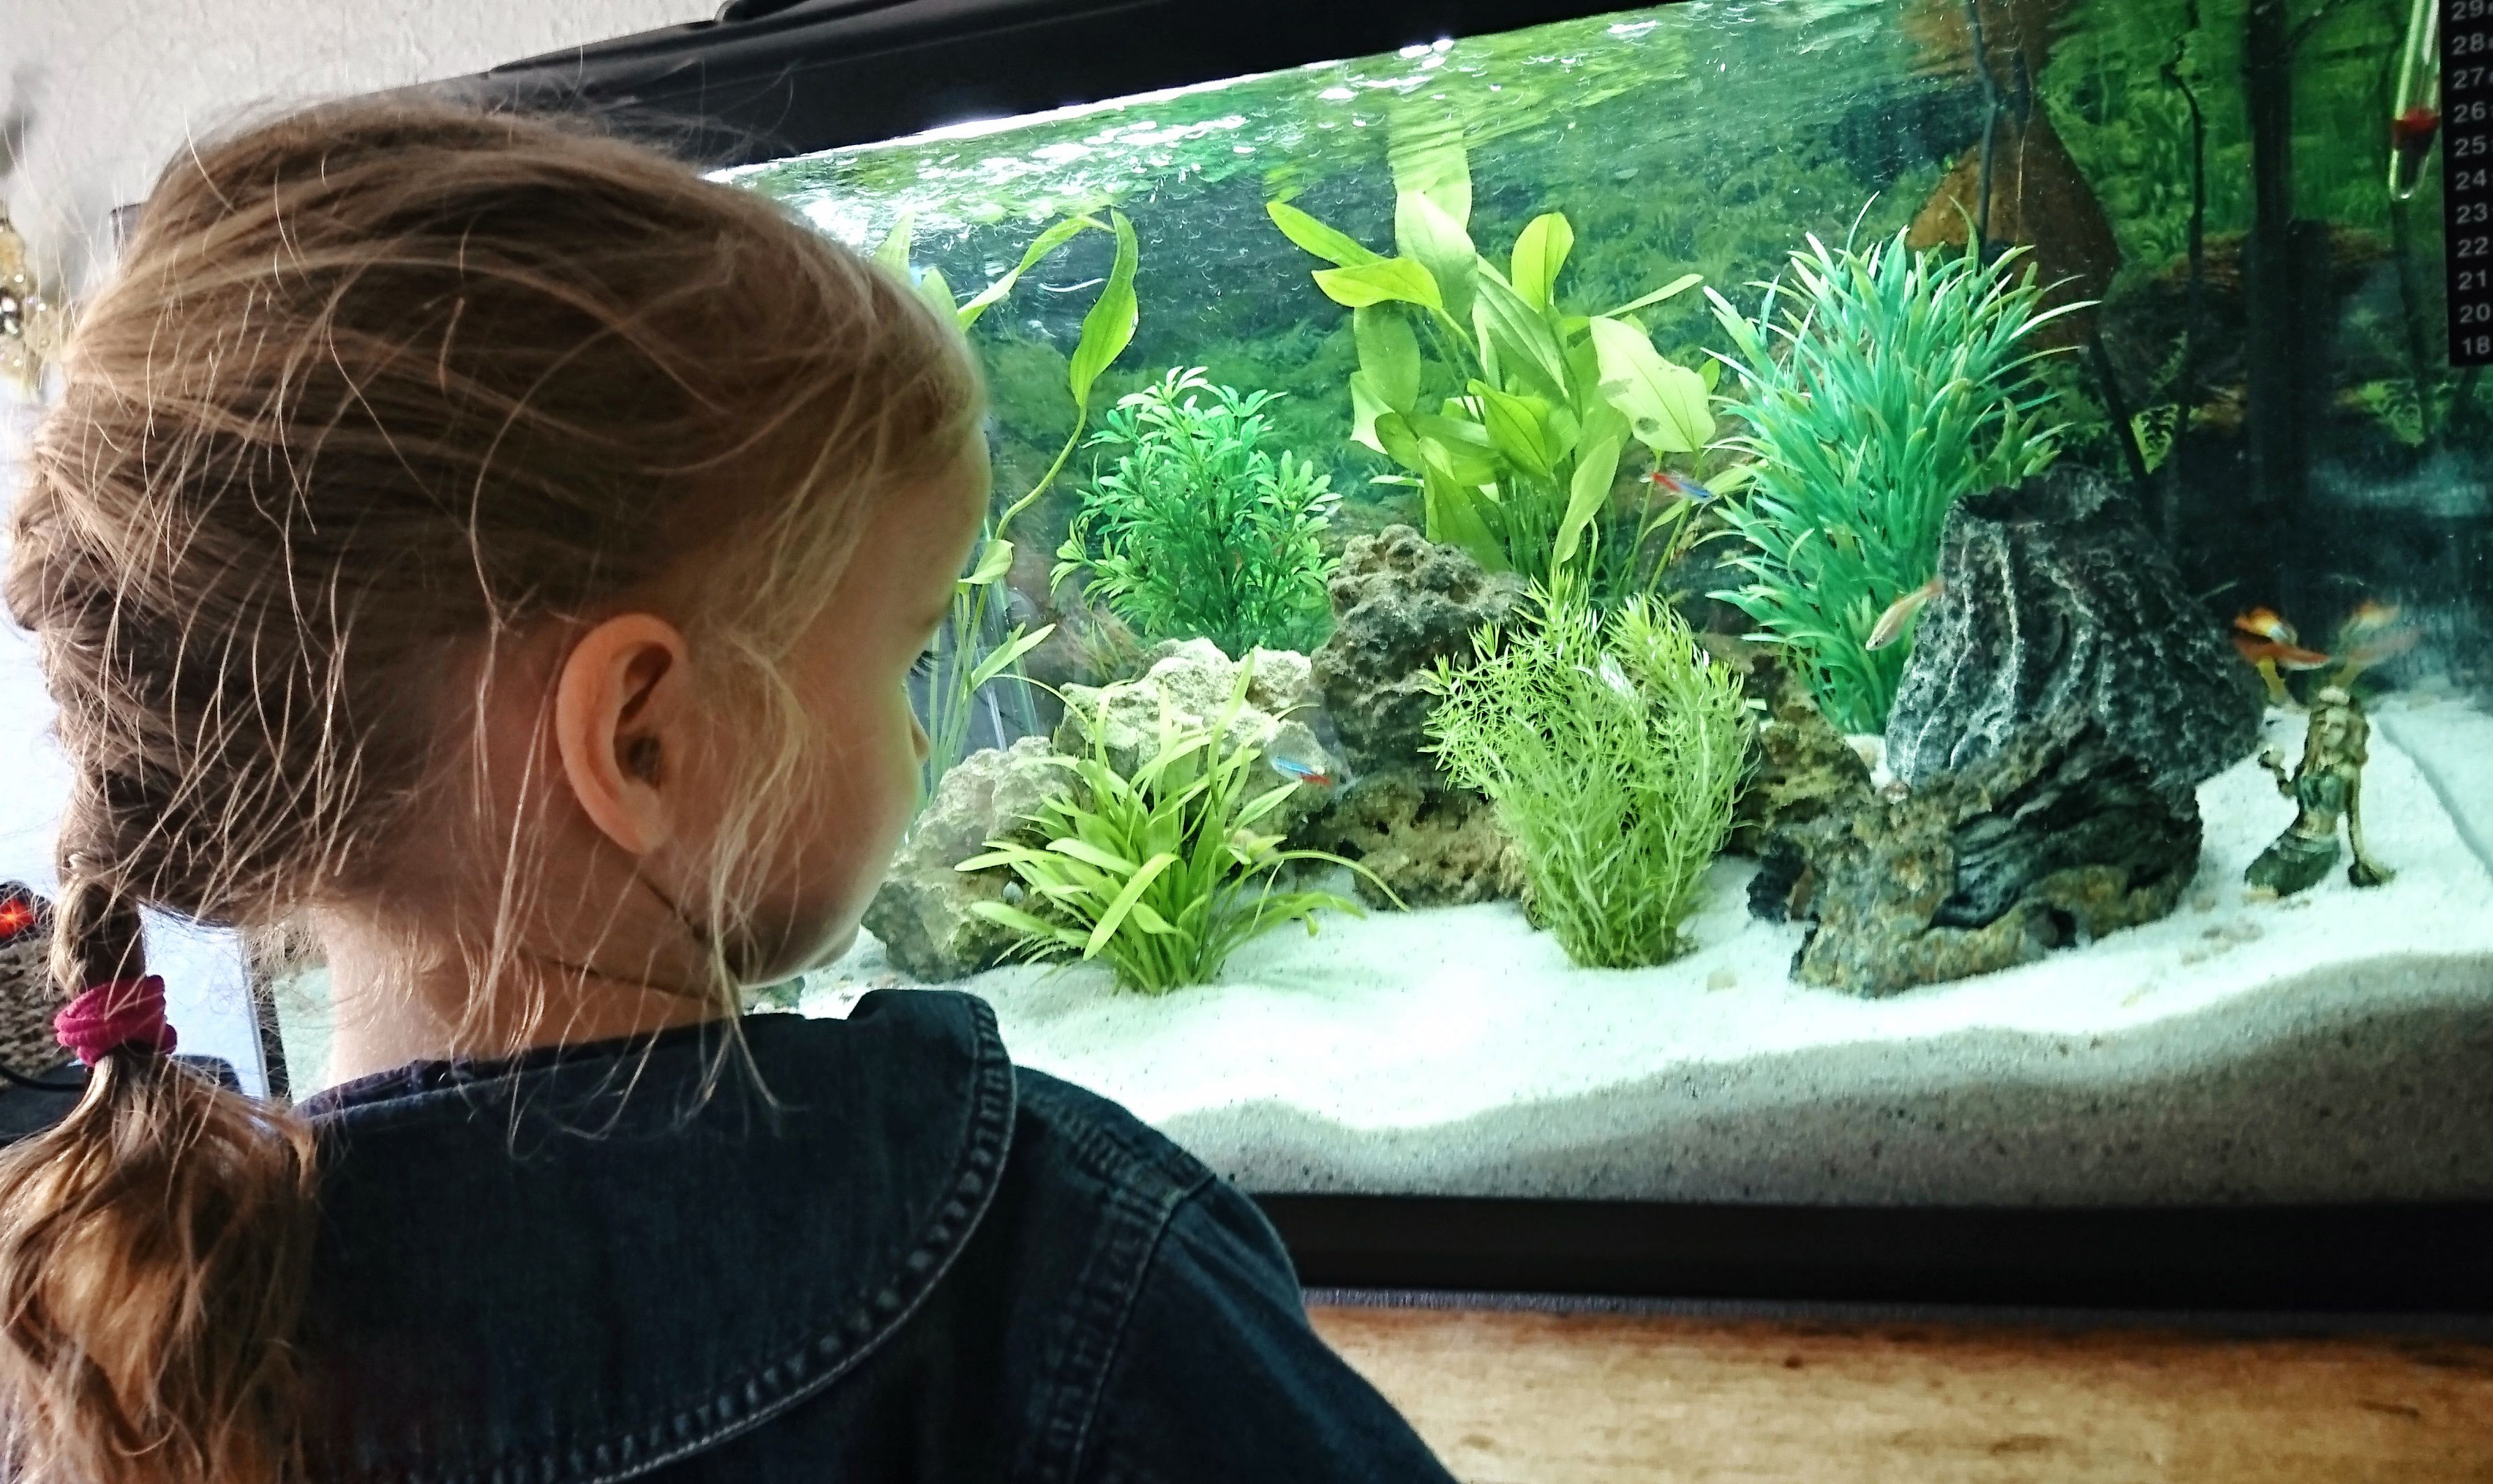 Child looking at fish in a home aquarium